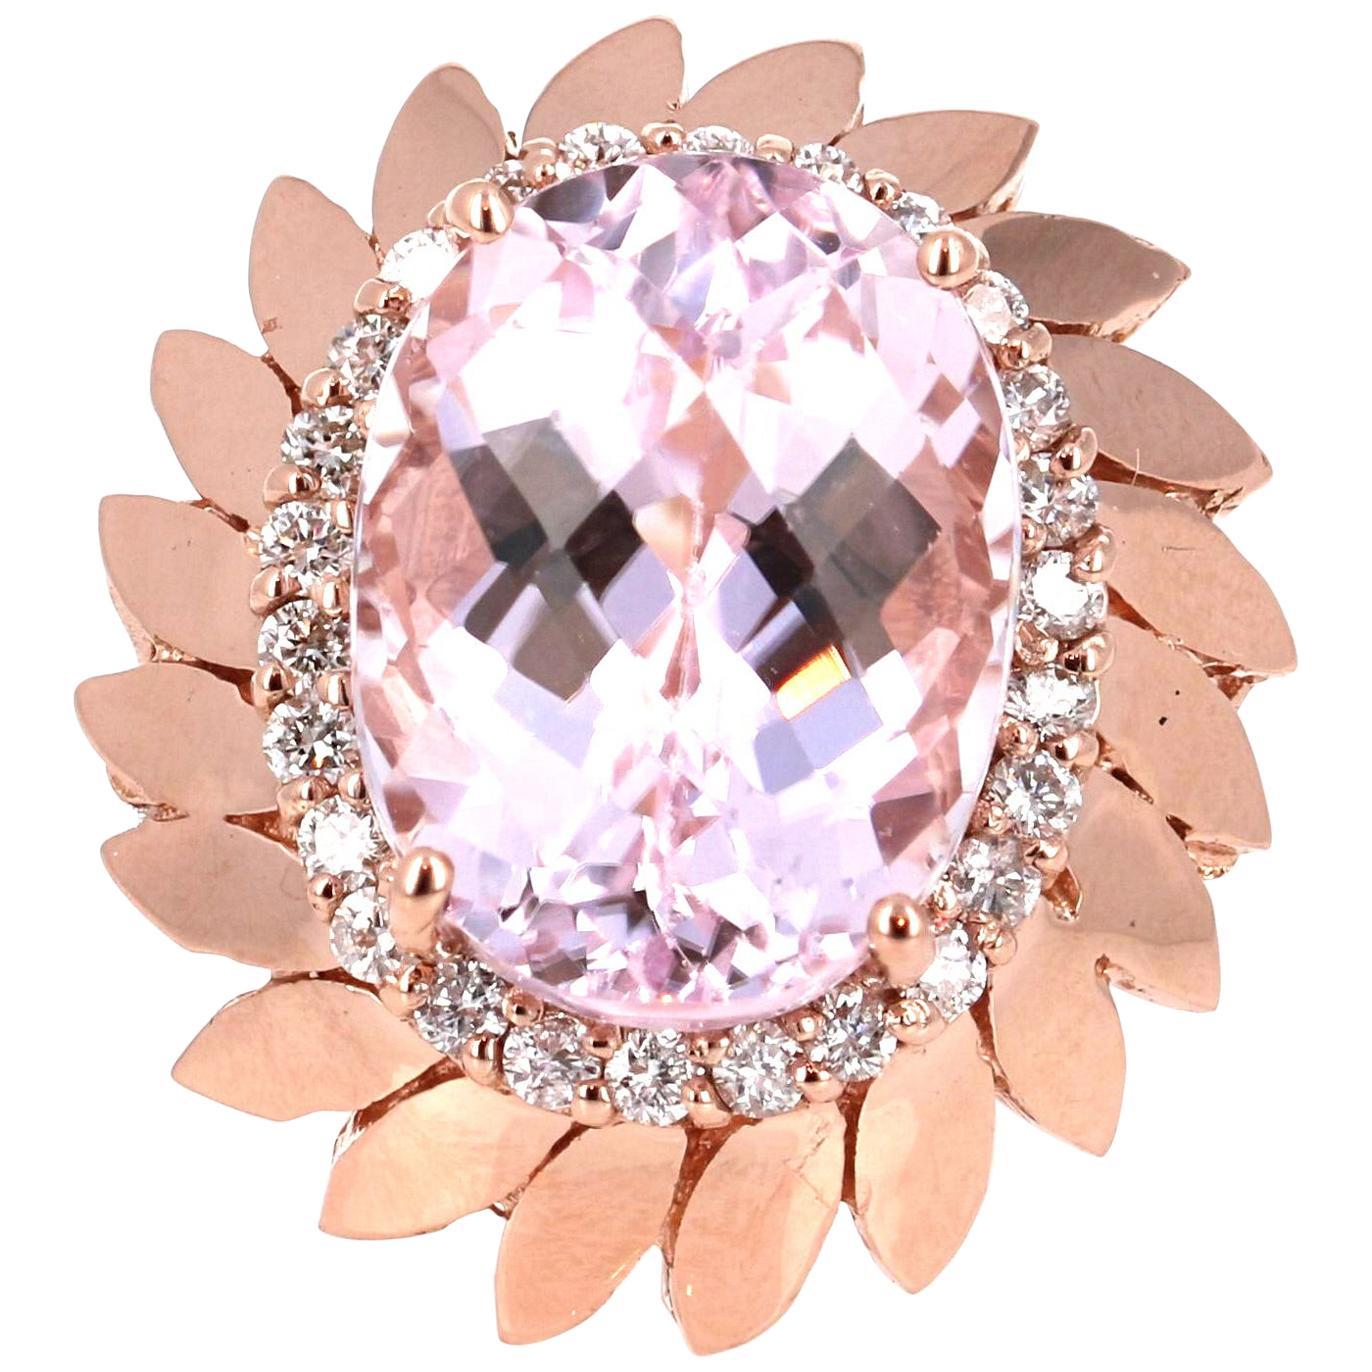 12.26 Carat Oval Cut Kunzite Diamond 14 Karat Rose Gold Cocktail Ring